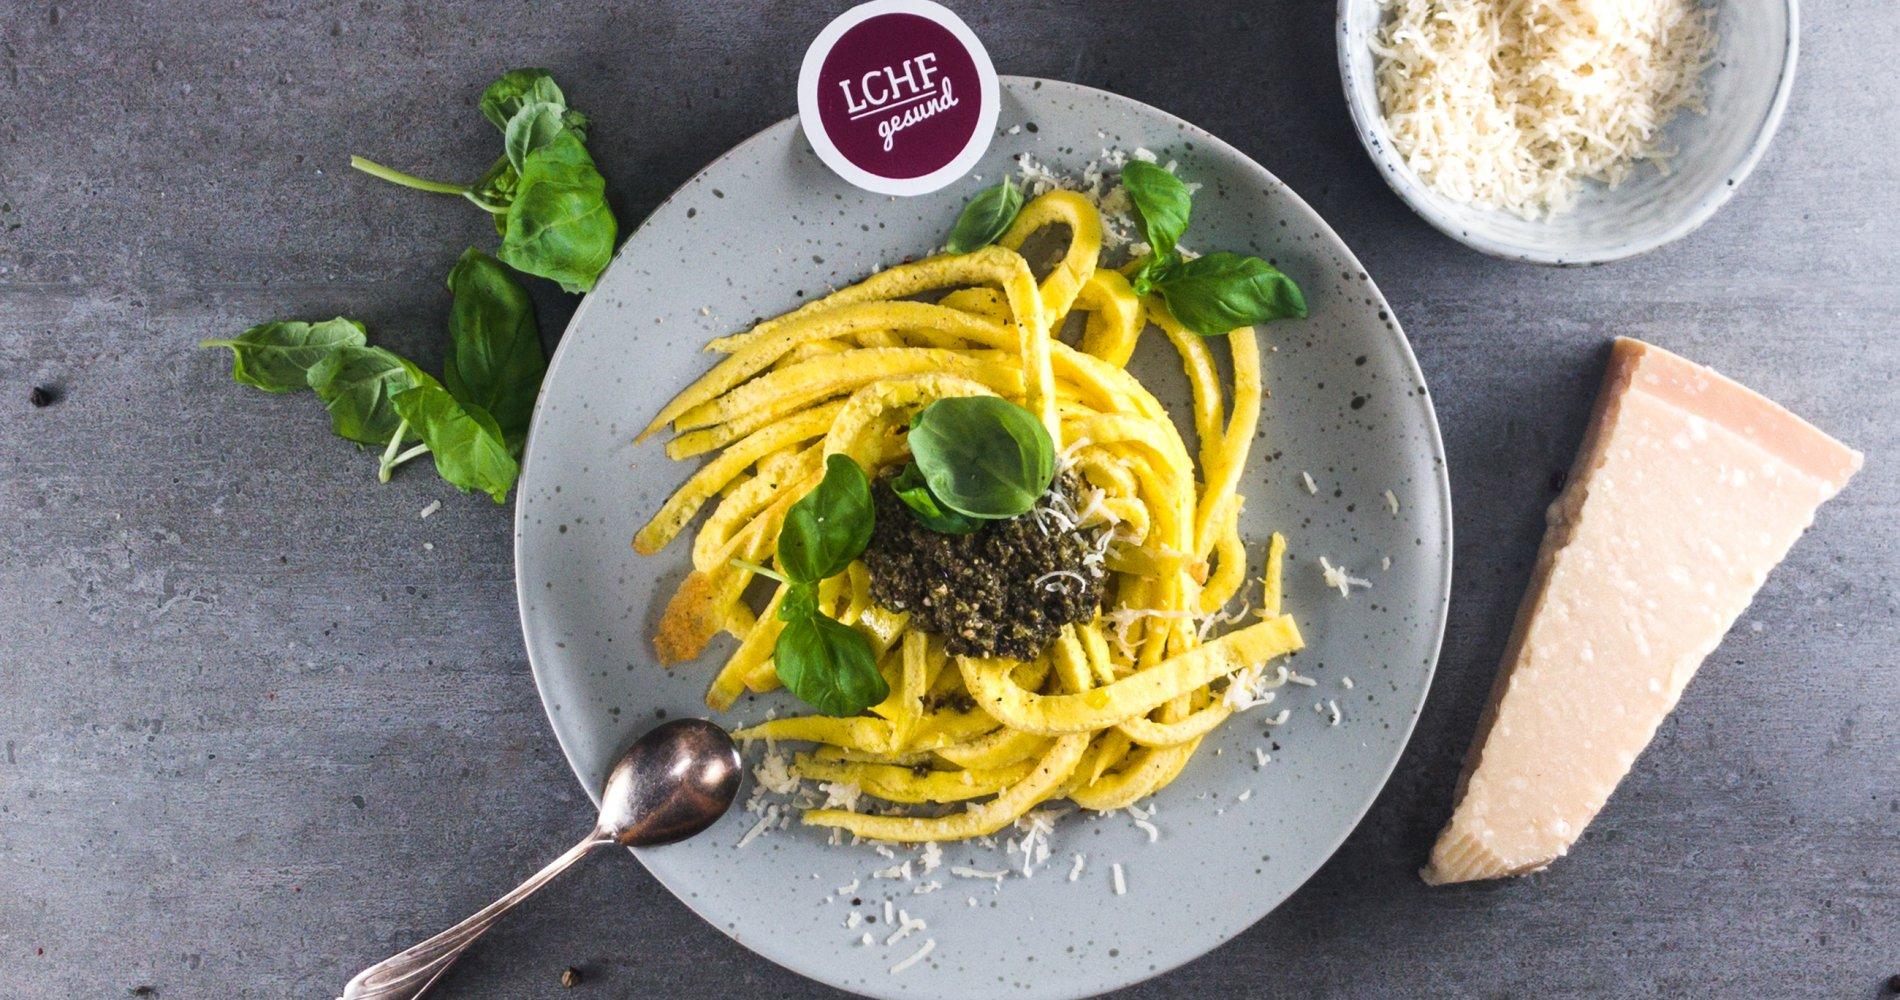 Rezept Low Carb: Eier-Flädle mit Basilikum-Pesto - LCHF-gesund.de